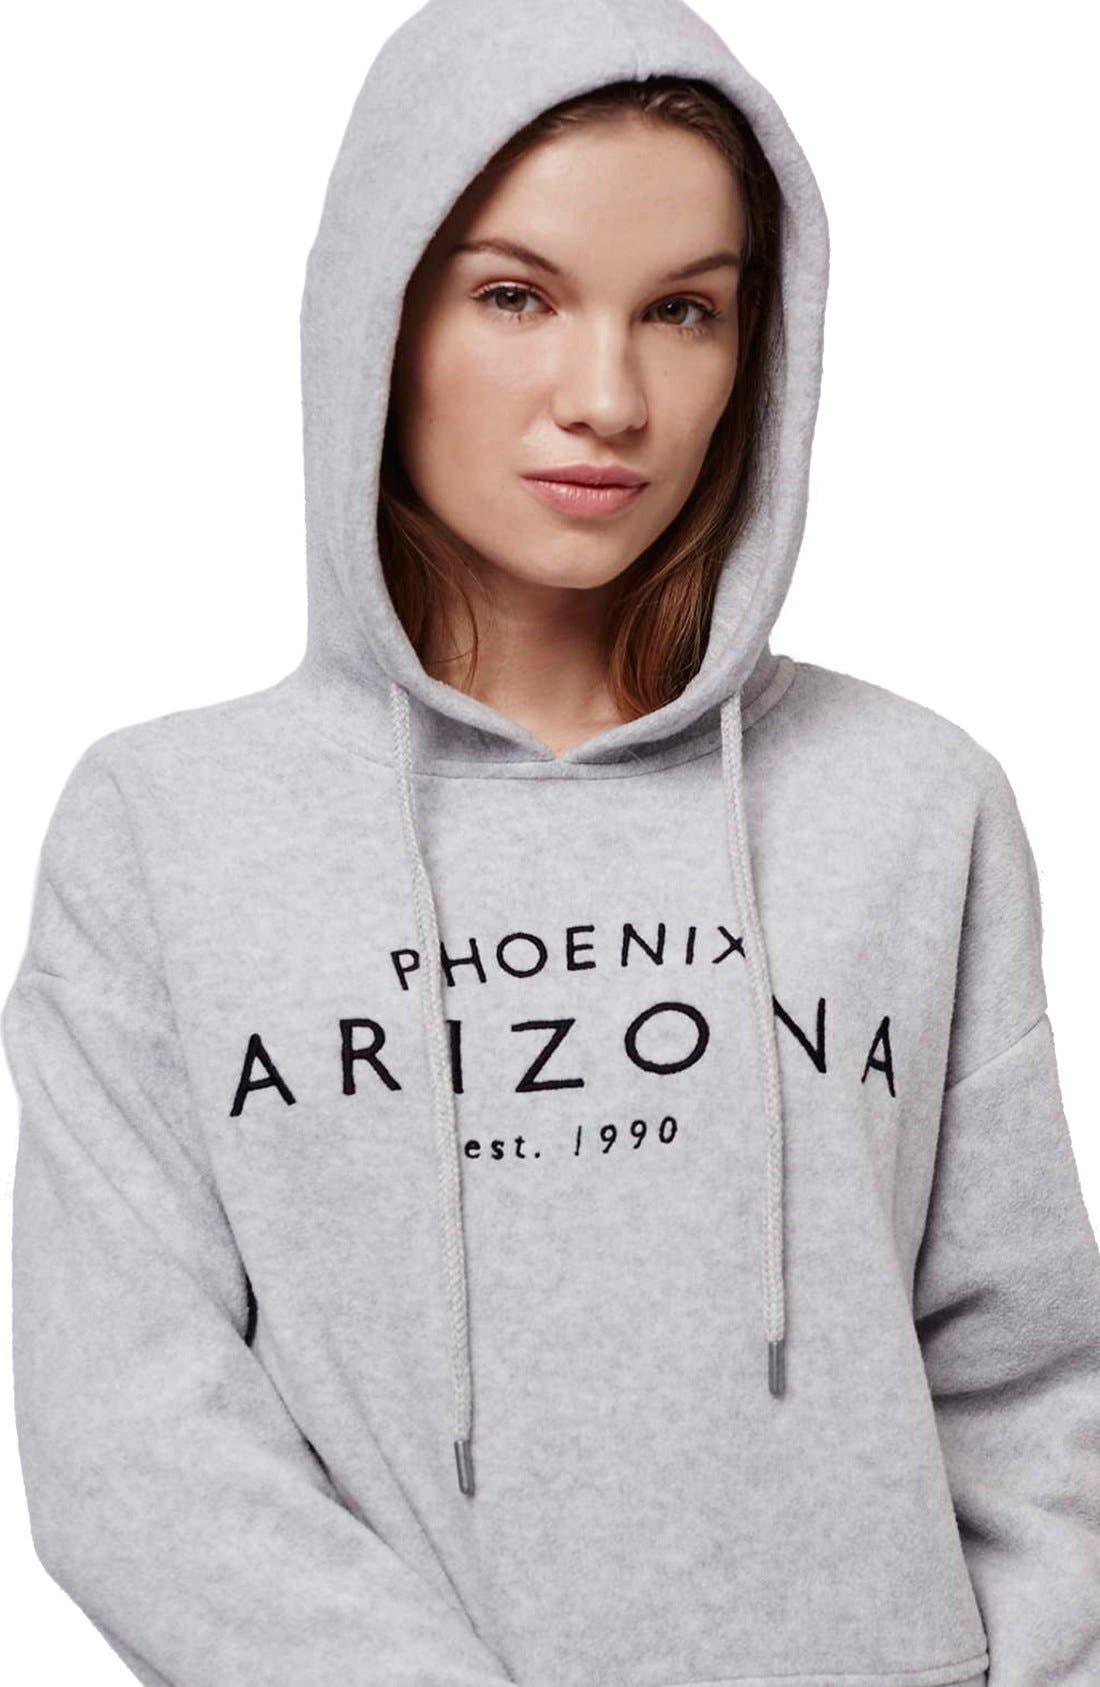 'Arizona' Embroidered Brushed Fleece Hoodie,                             Alternate thumbnail 2, color,                             050